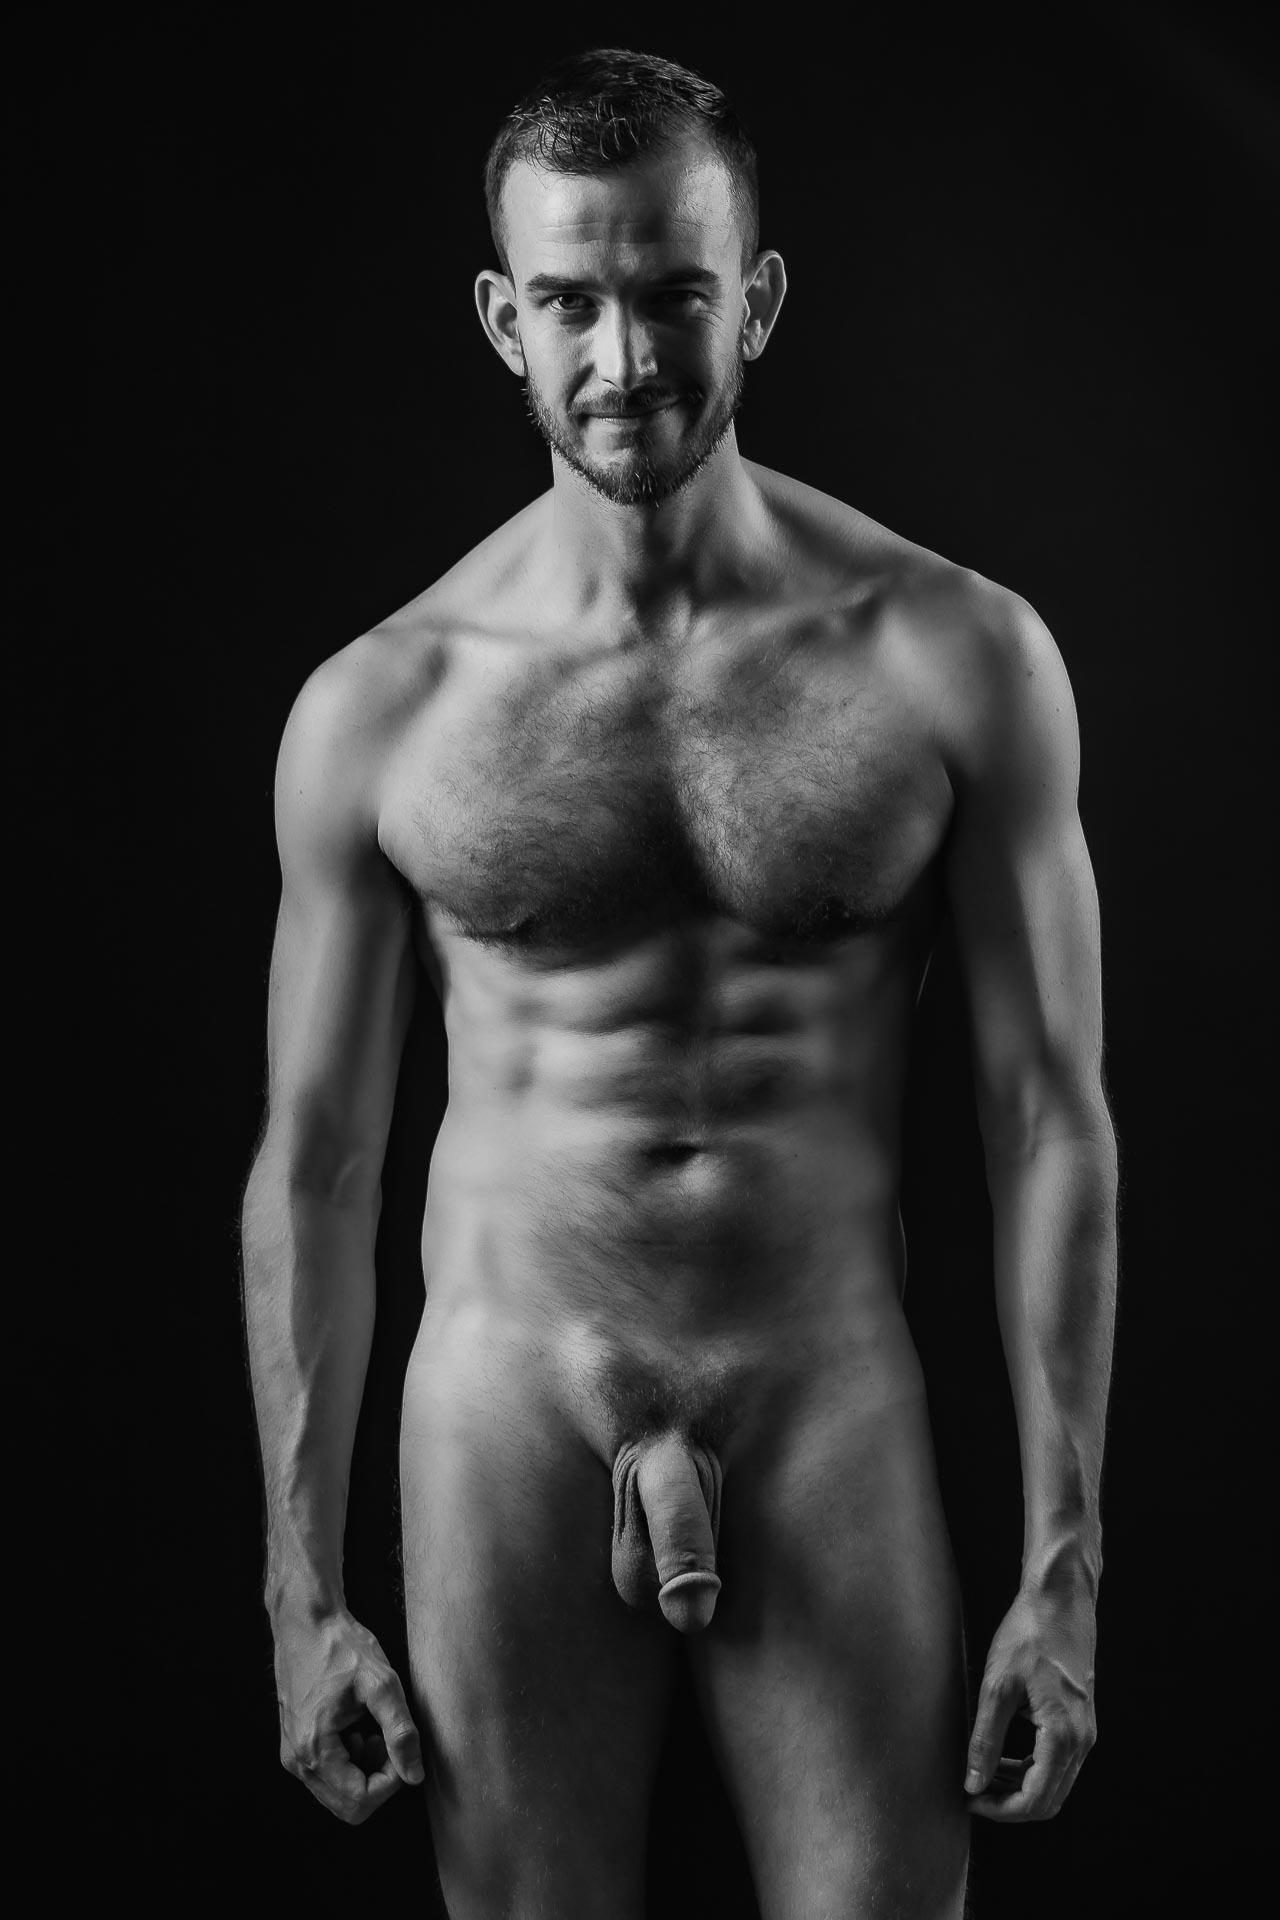 Männerakt-nackte Haut-Aktshooting-nackt-gay